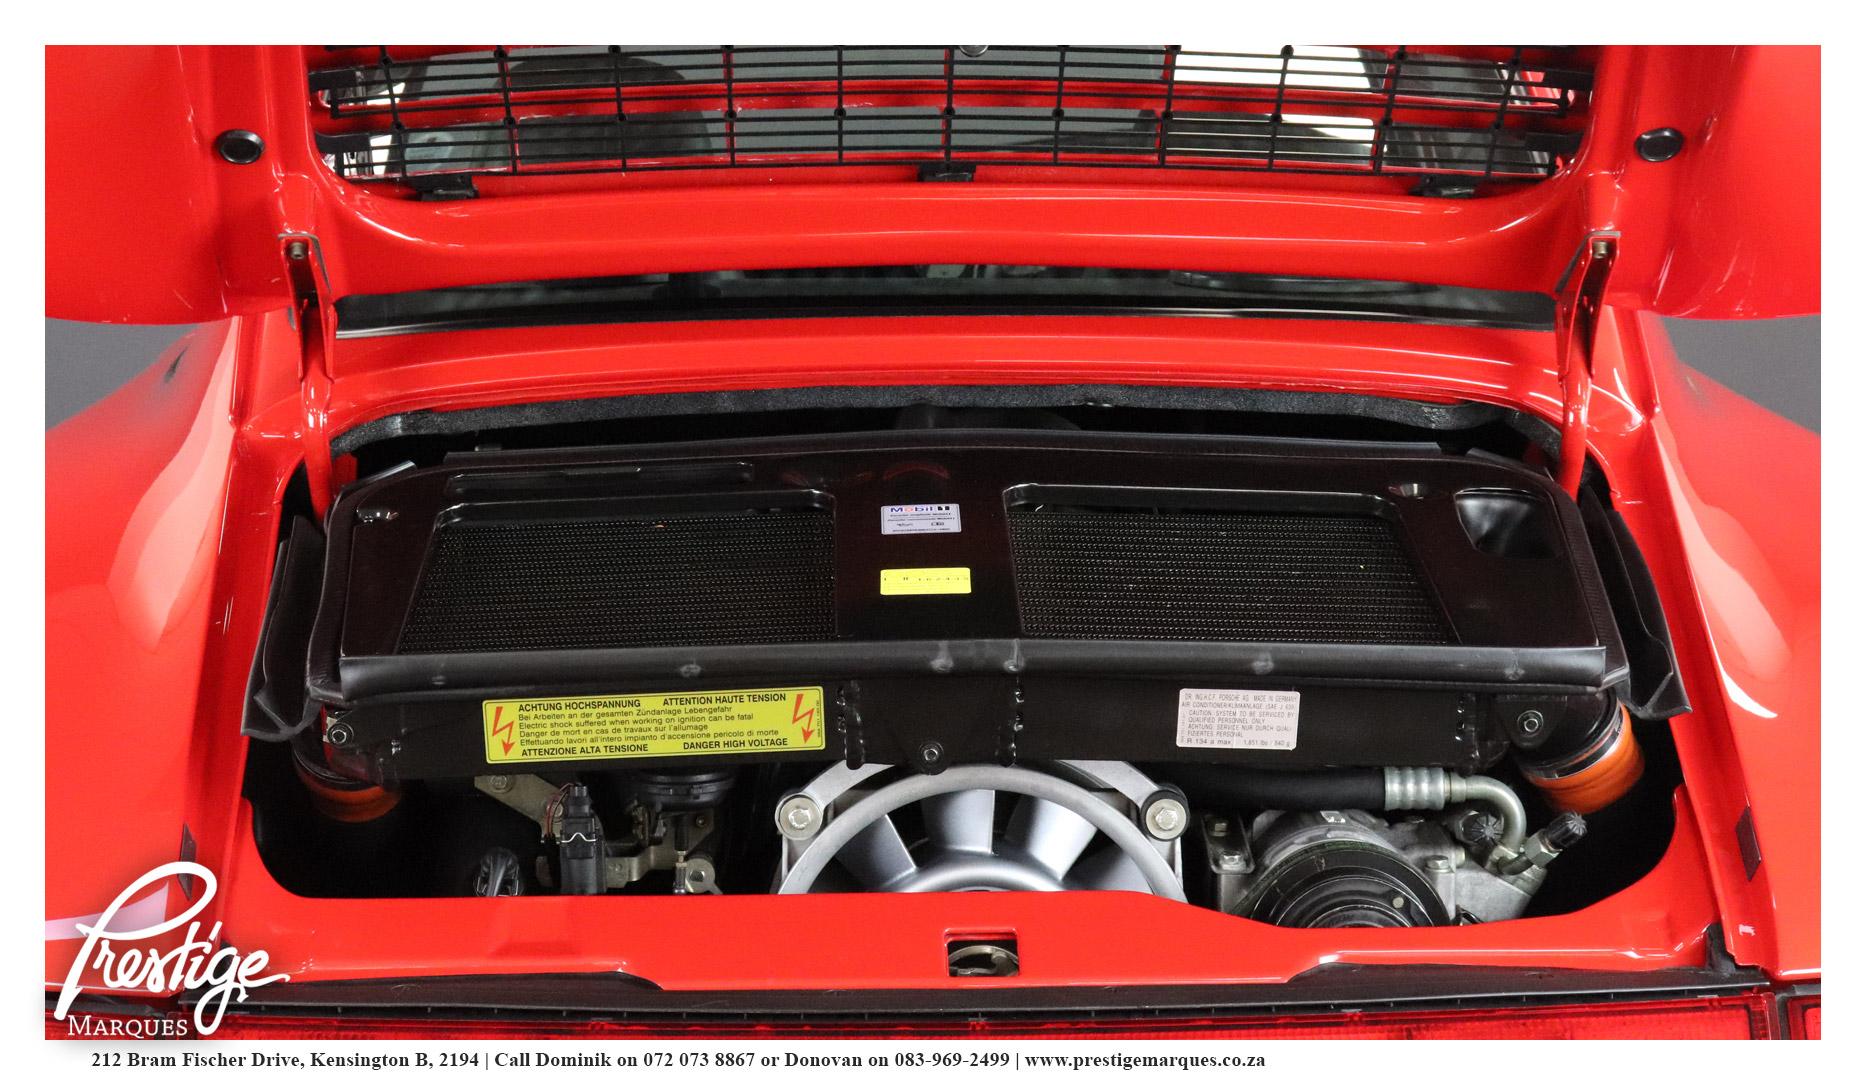 Porsche-911-993-Turbo-Prestige-Marques-Randburg-Sandton-10